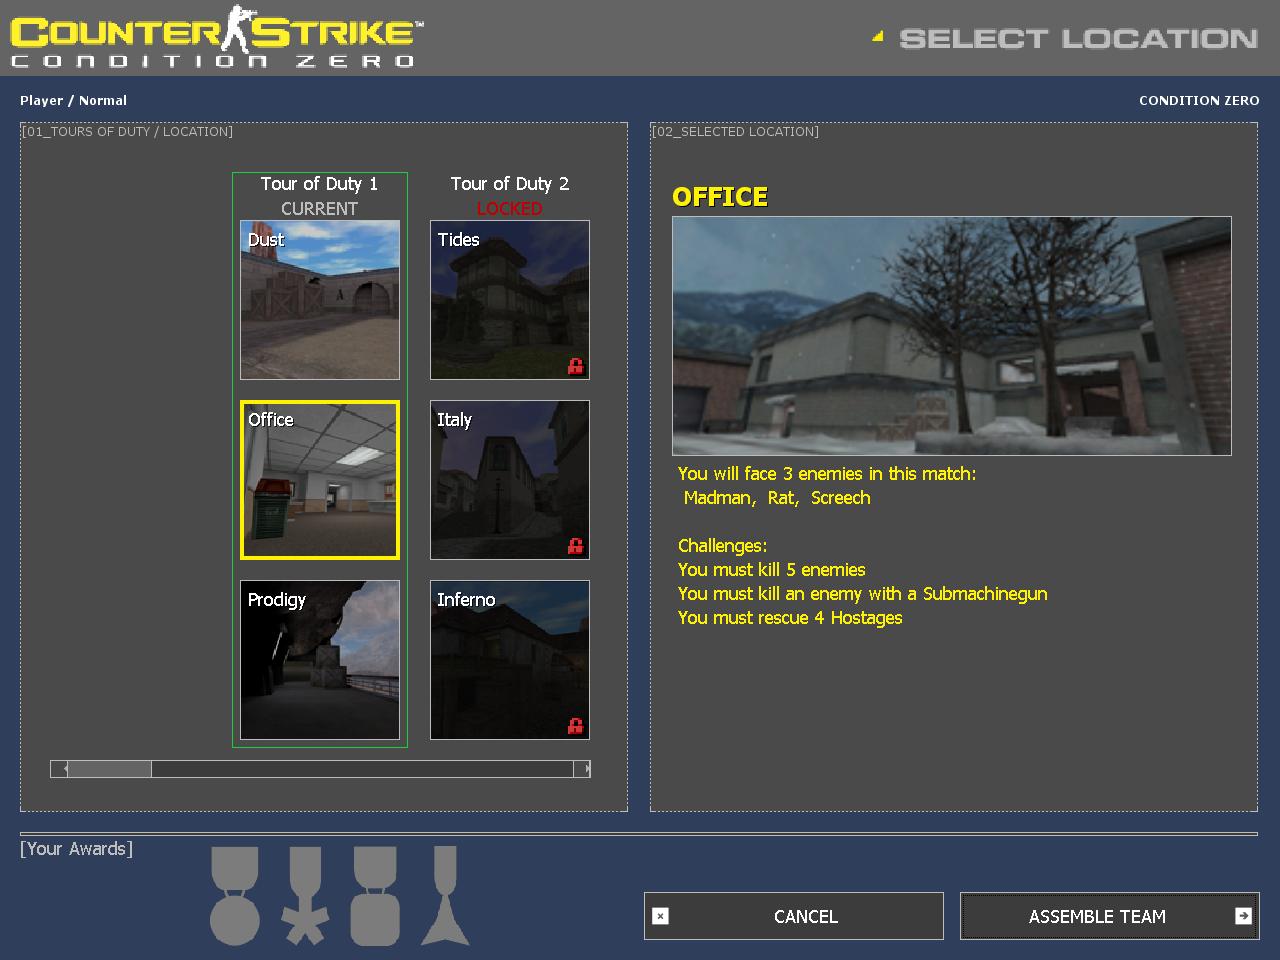 Counter Strike Condition Zero Maps Counter Strike: Condition Zero   Counter Strike Wiki   FANDOM